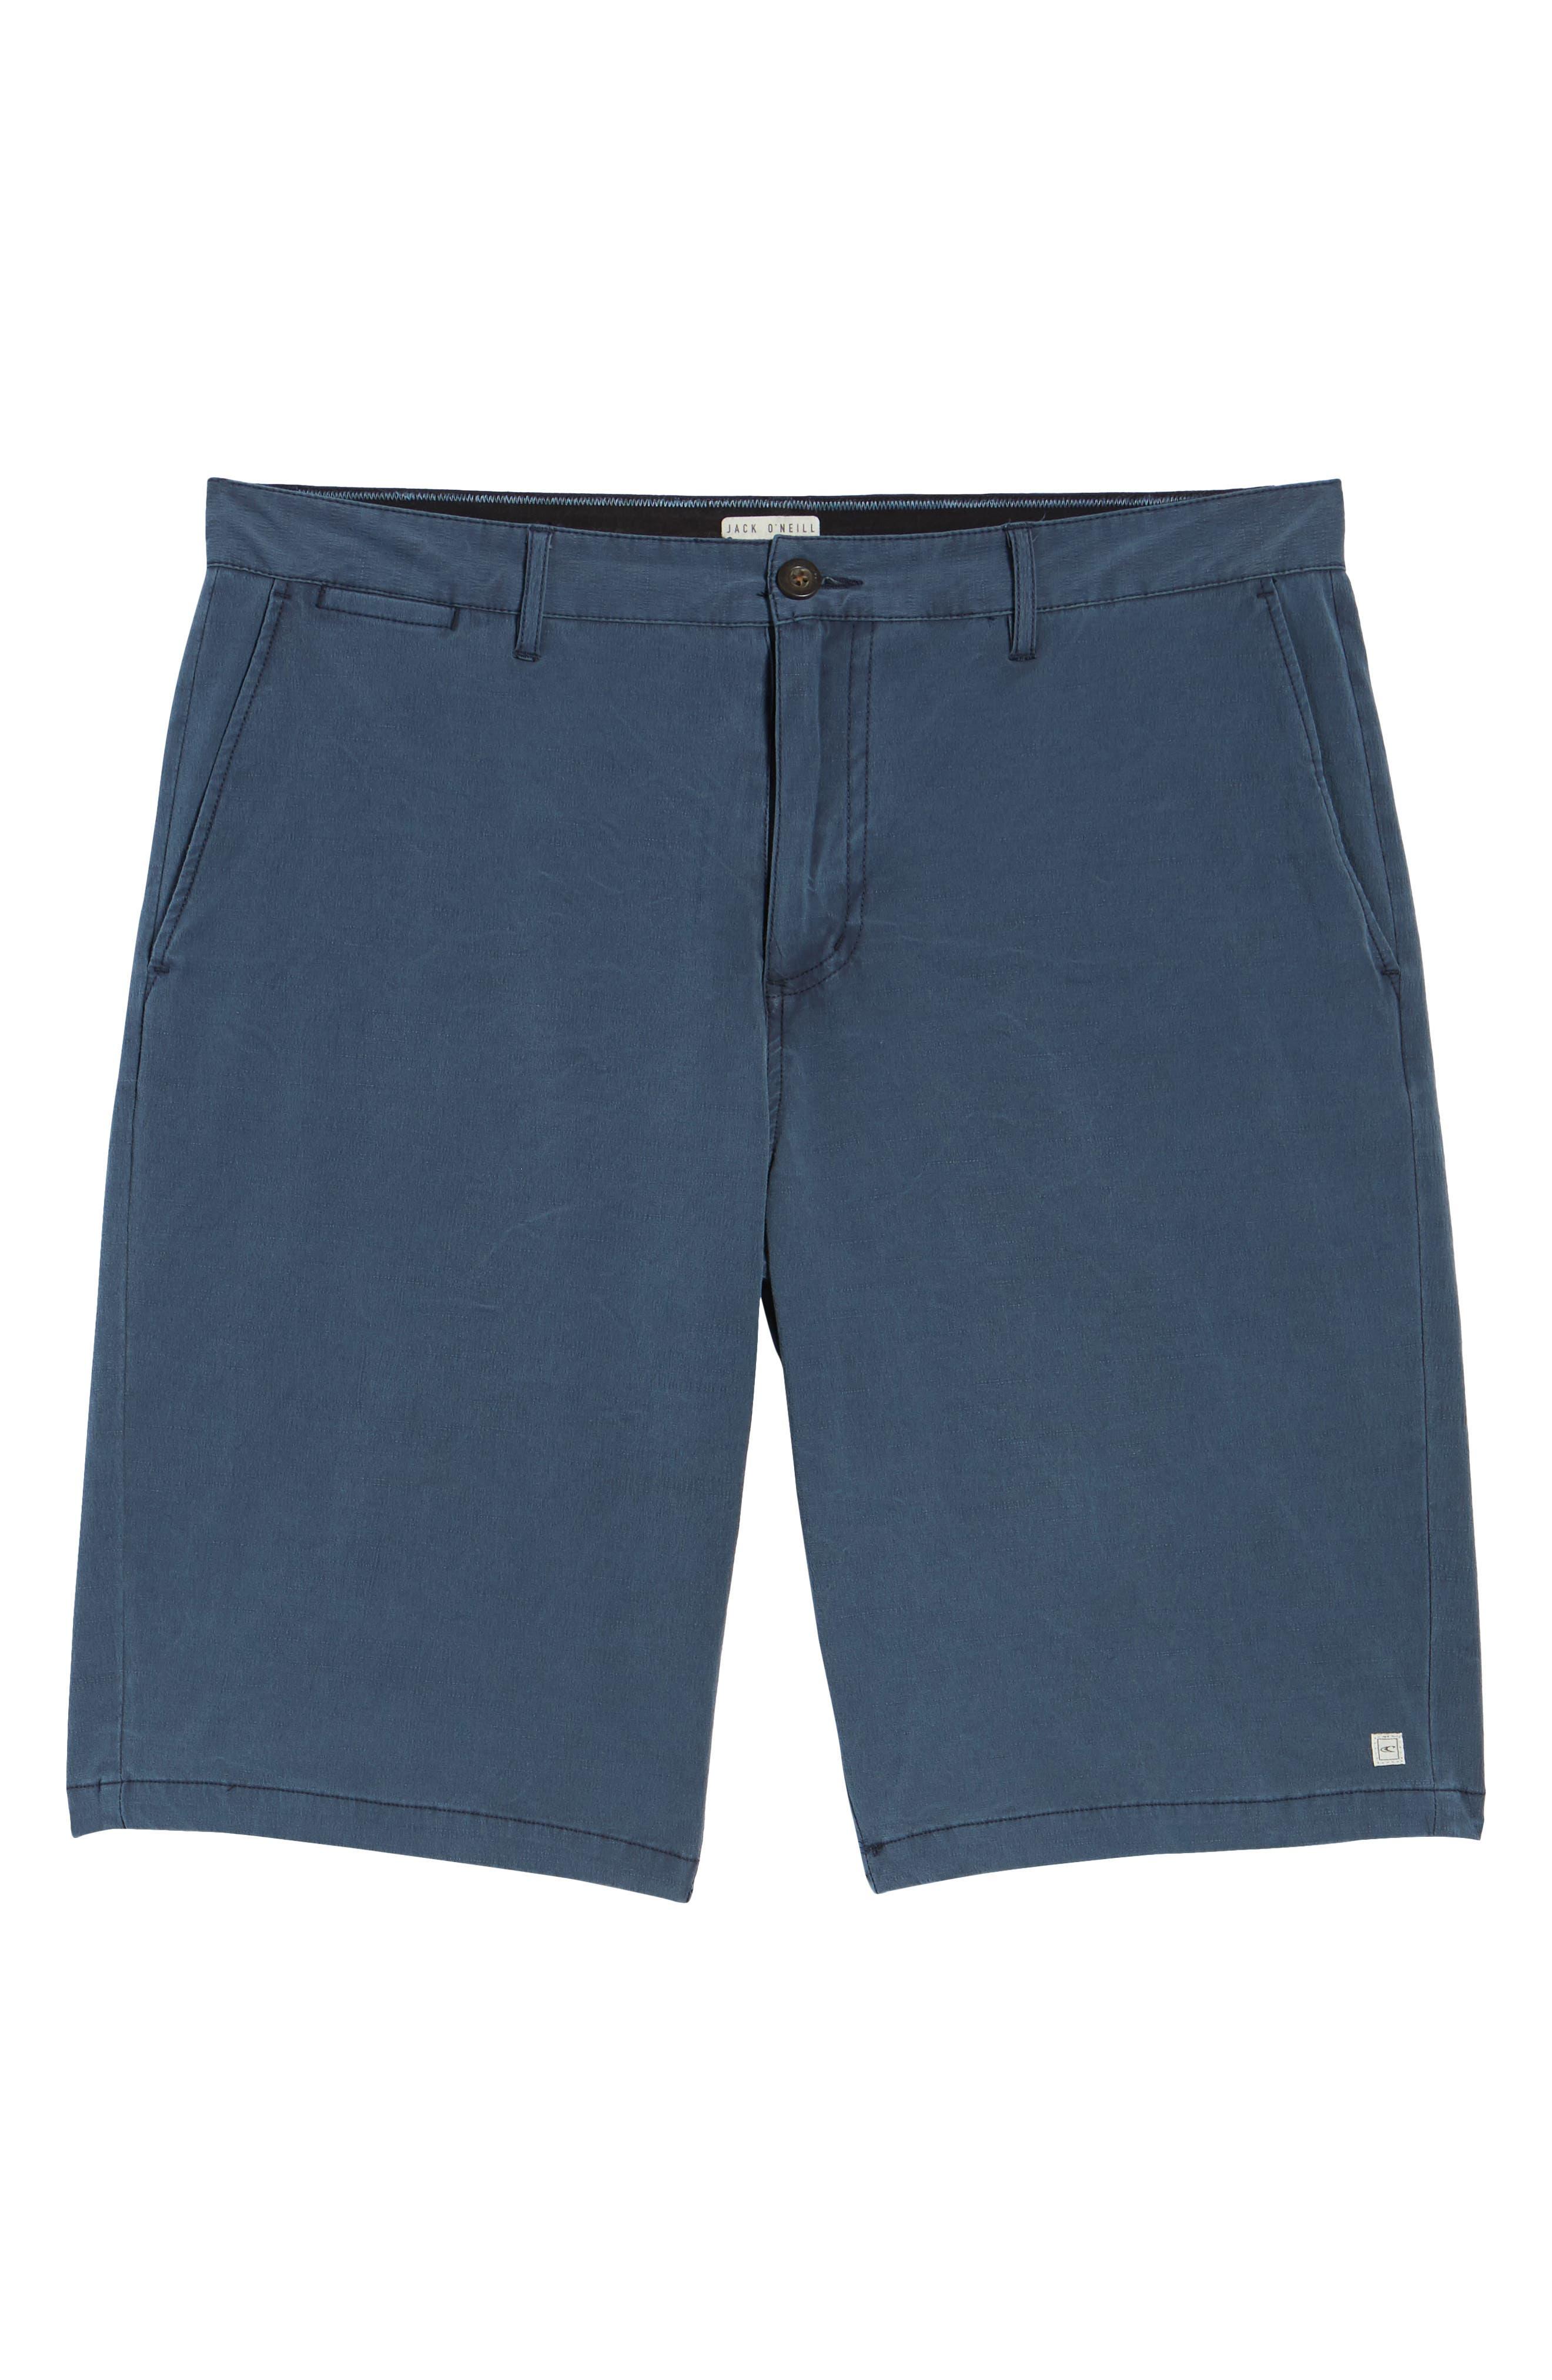 Coast Stretch Board Shorts,                             Alternate thumbnail 18, color,